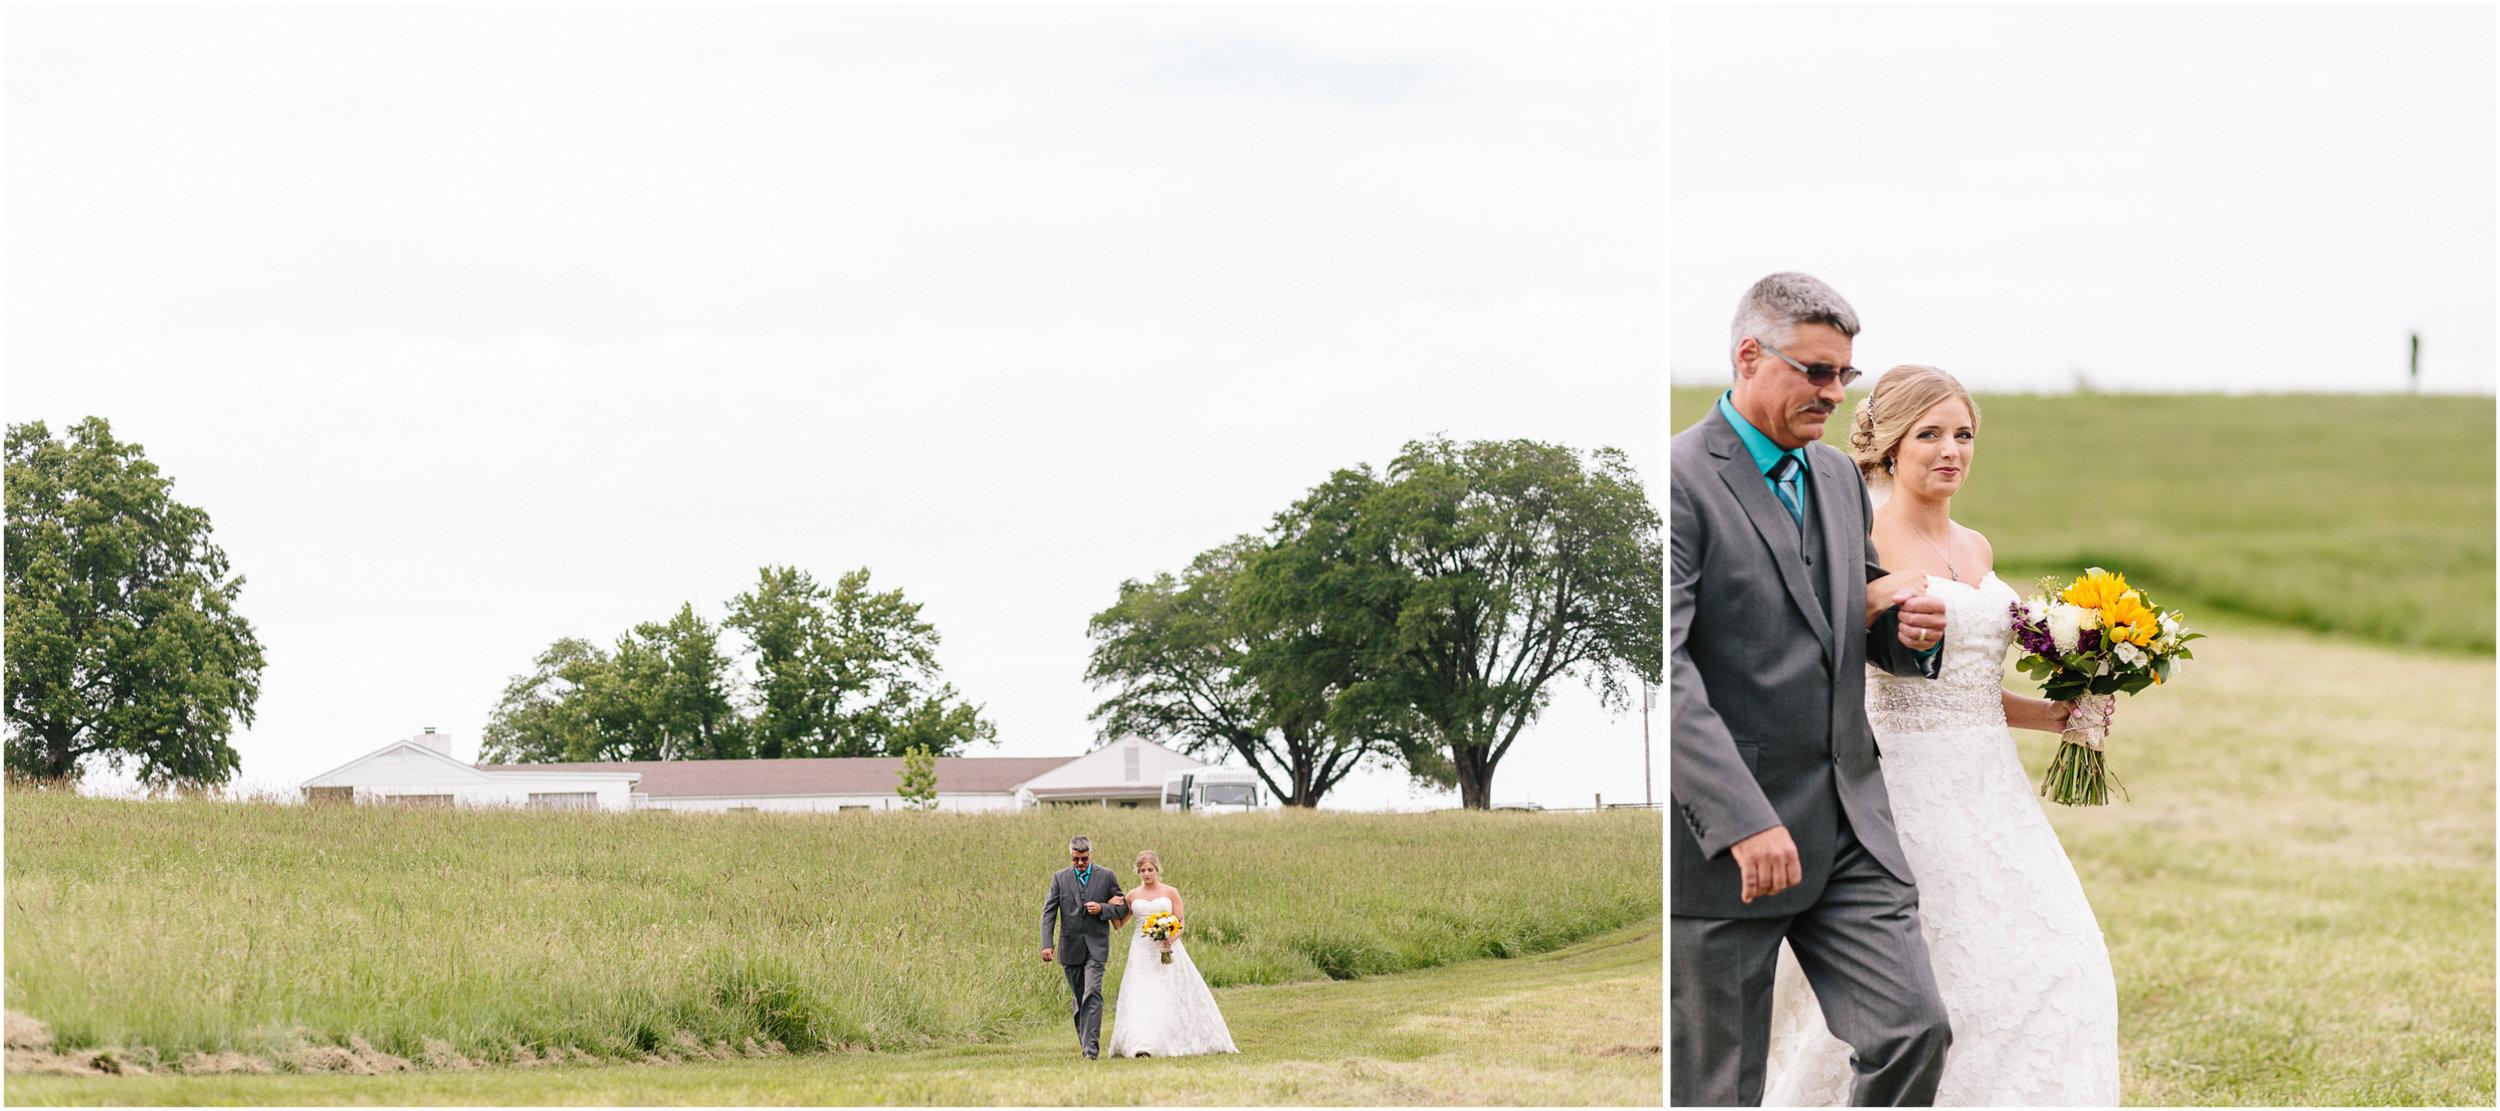 alyssa barletter photography louisburg kansas town square paola rustic wedding-29.jpg